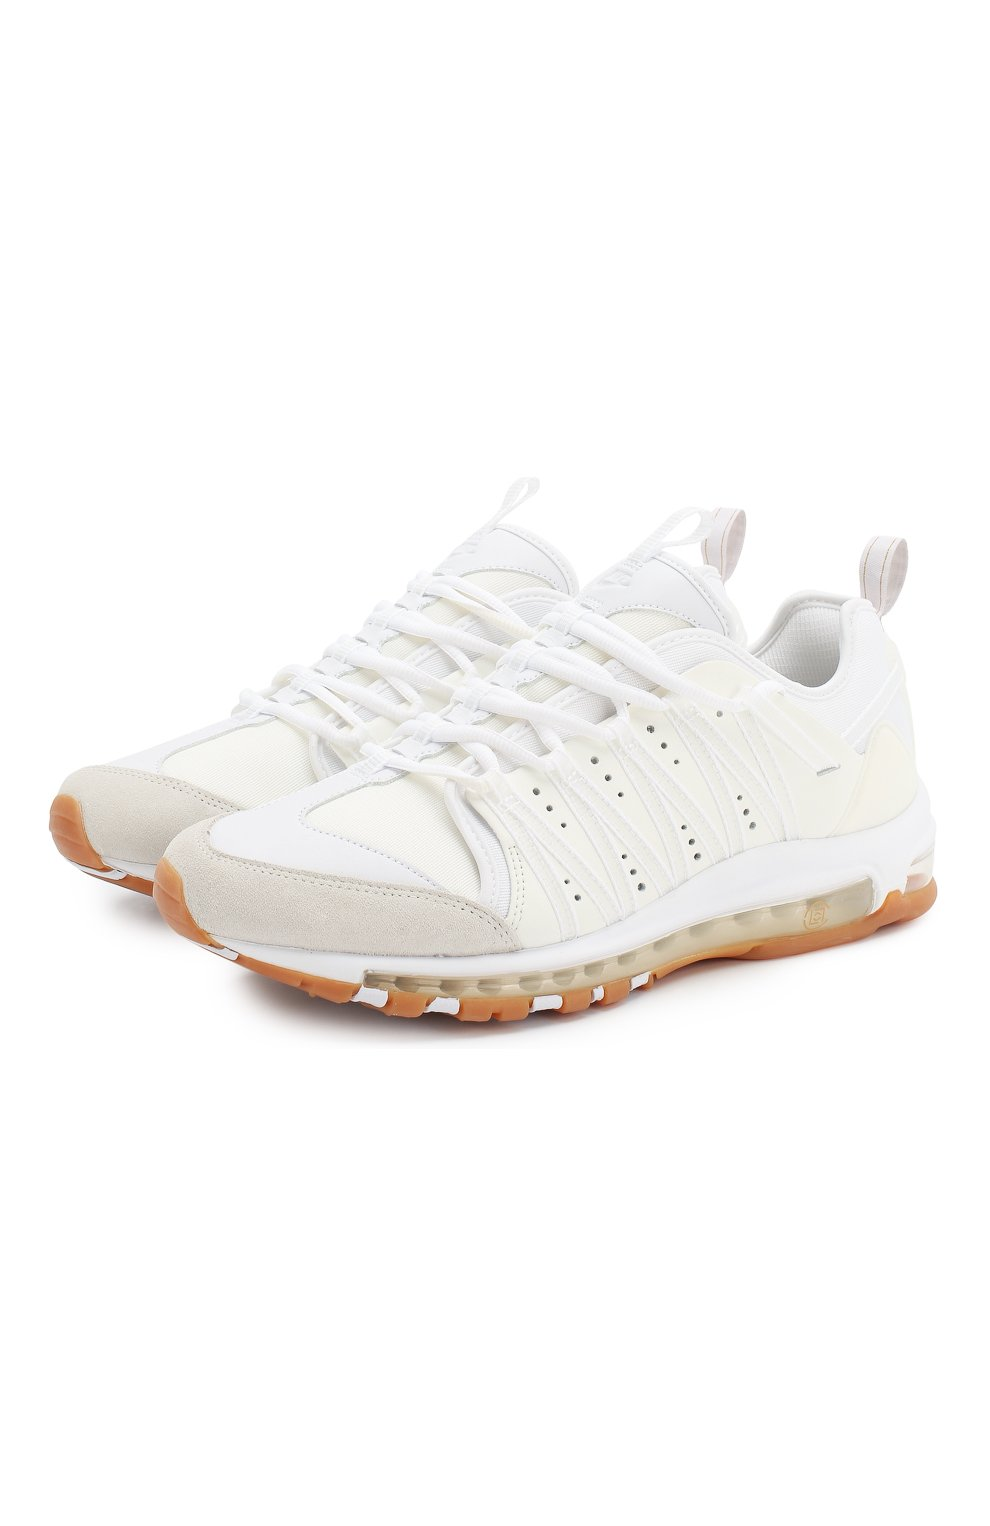 dde9f1f7 Мужские белые кроссовки nike x clot air max haven NIKELAB — купить ...